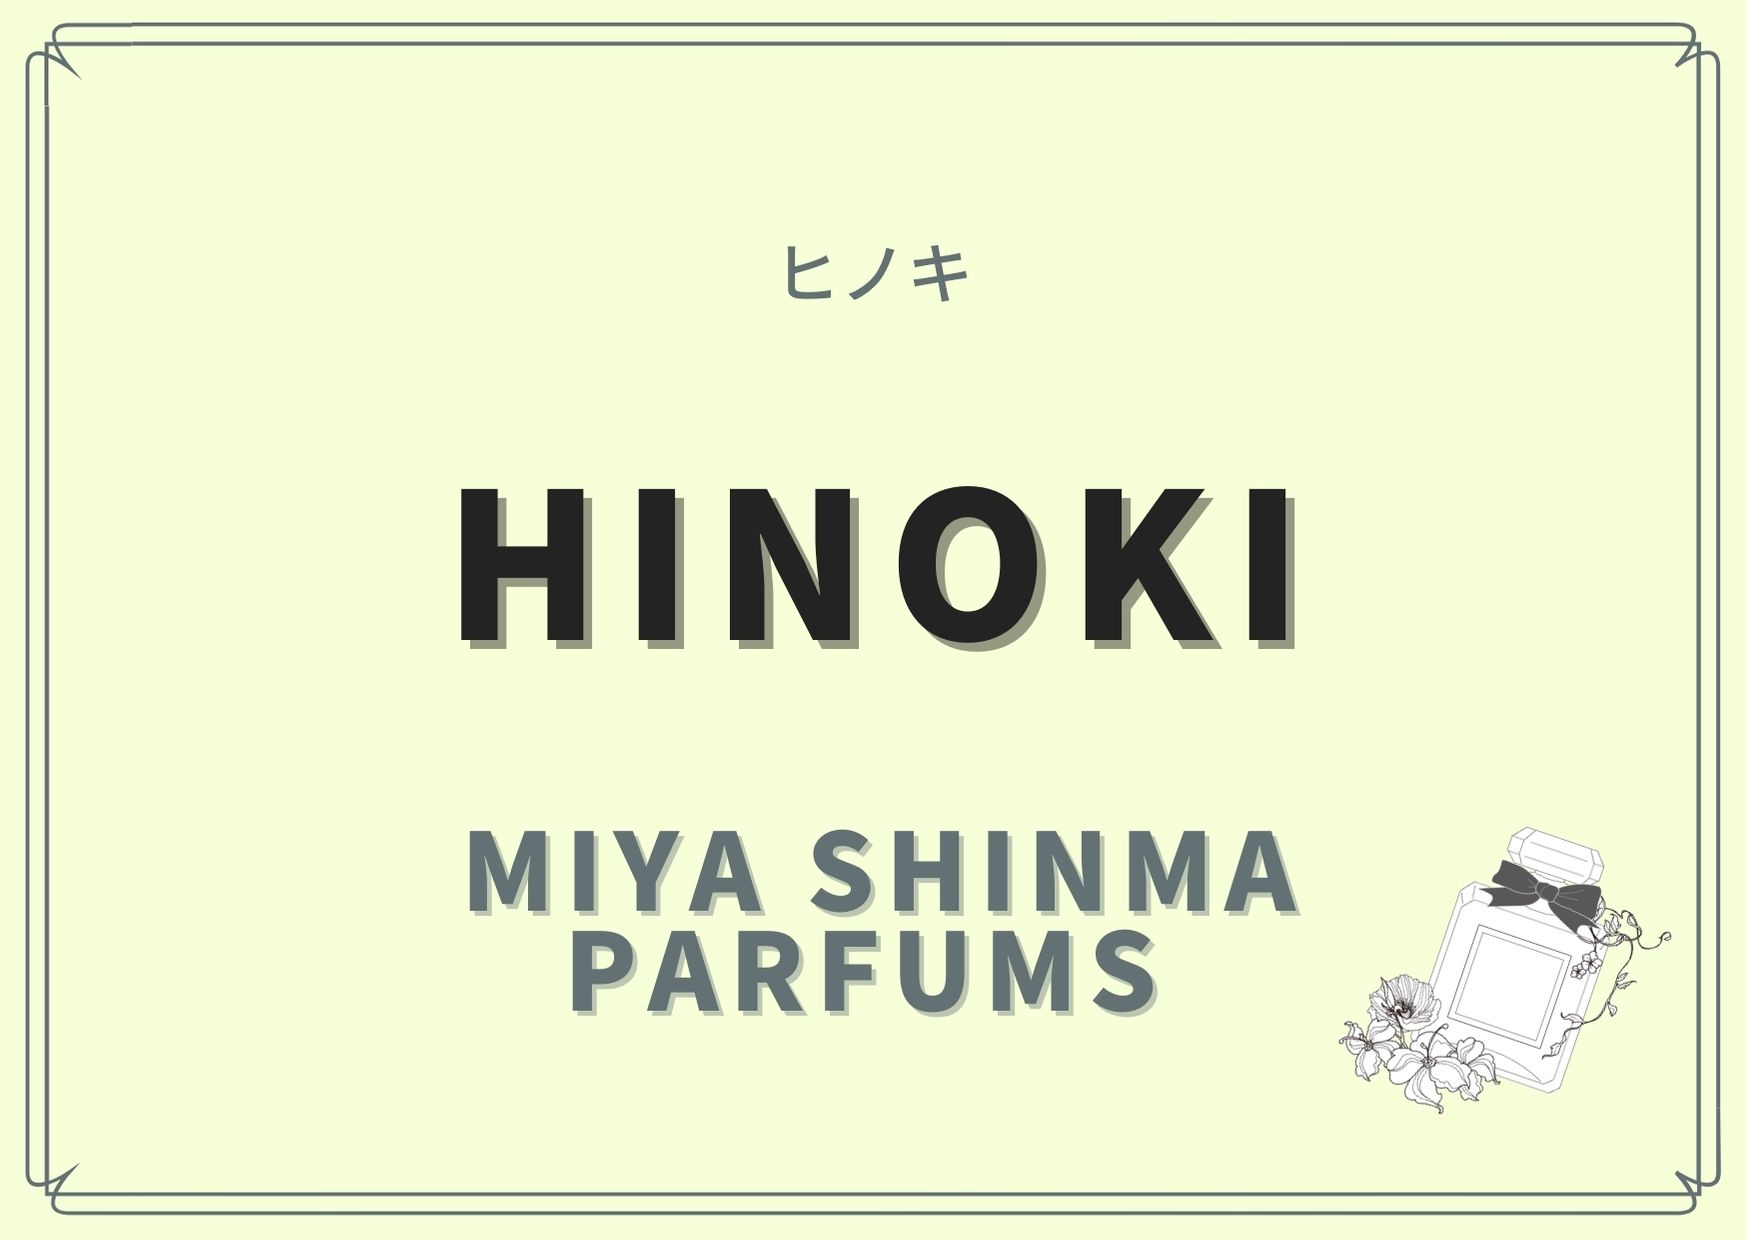 HINOKI(ヒノキ)/Miya Shinma parfums (ミヤ シンマ パルファン)